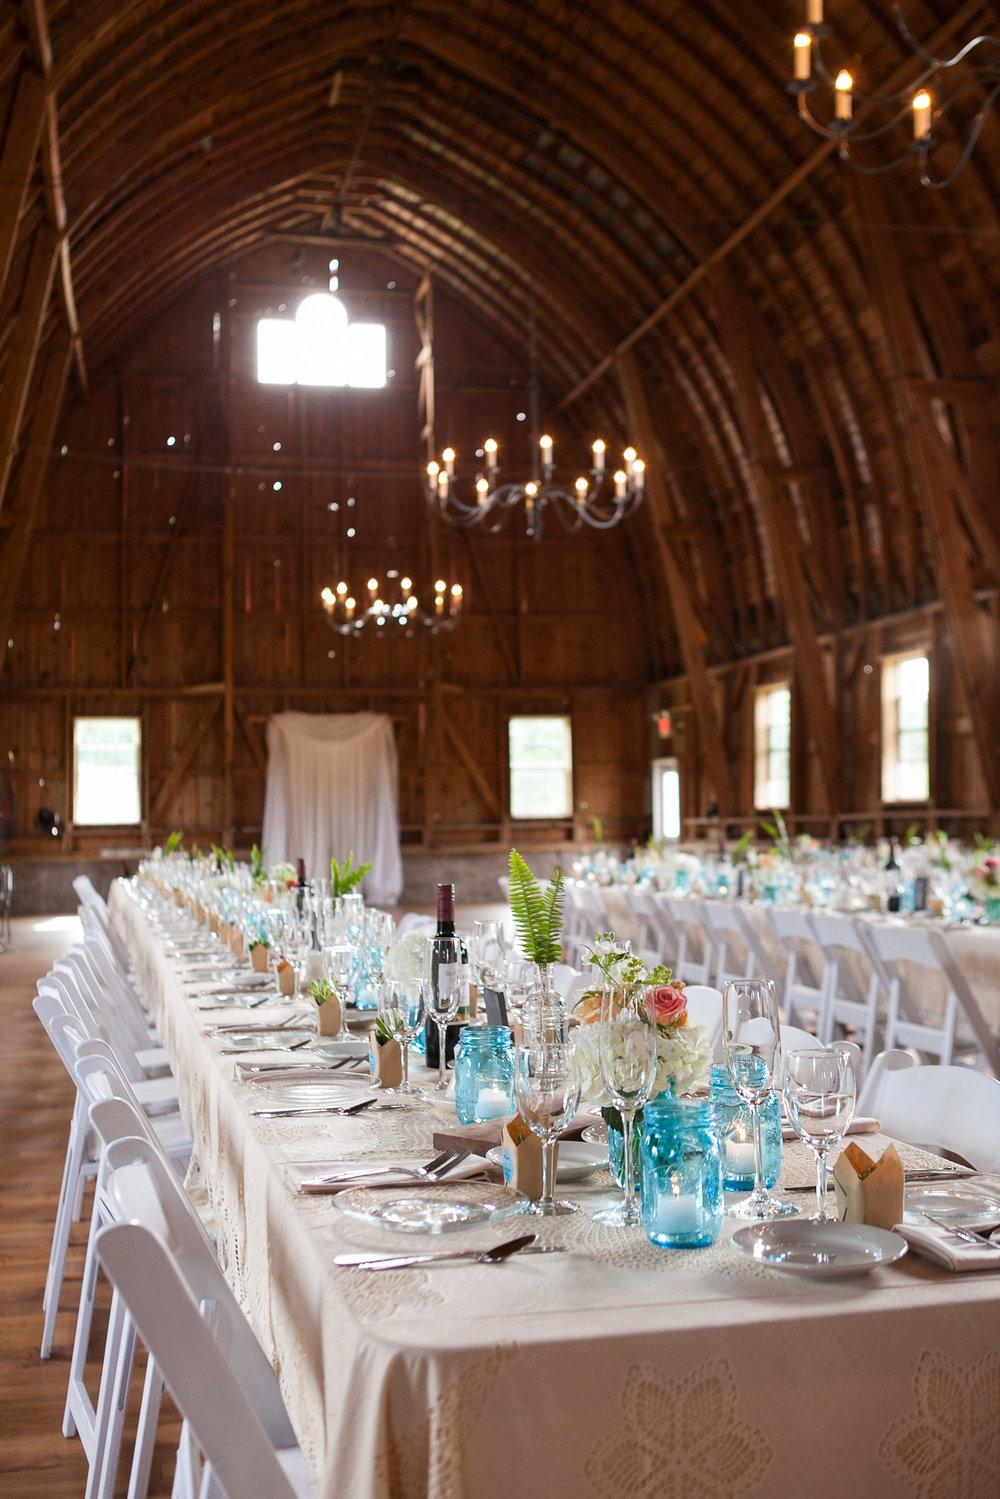 Sugarland-Wisconsin-barn-summer-wedding_096.jpg